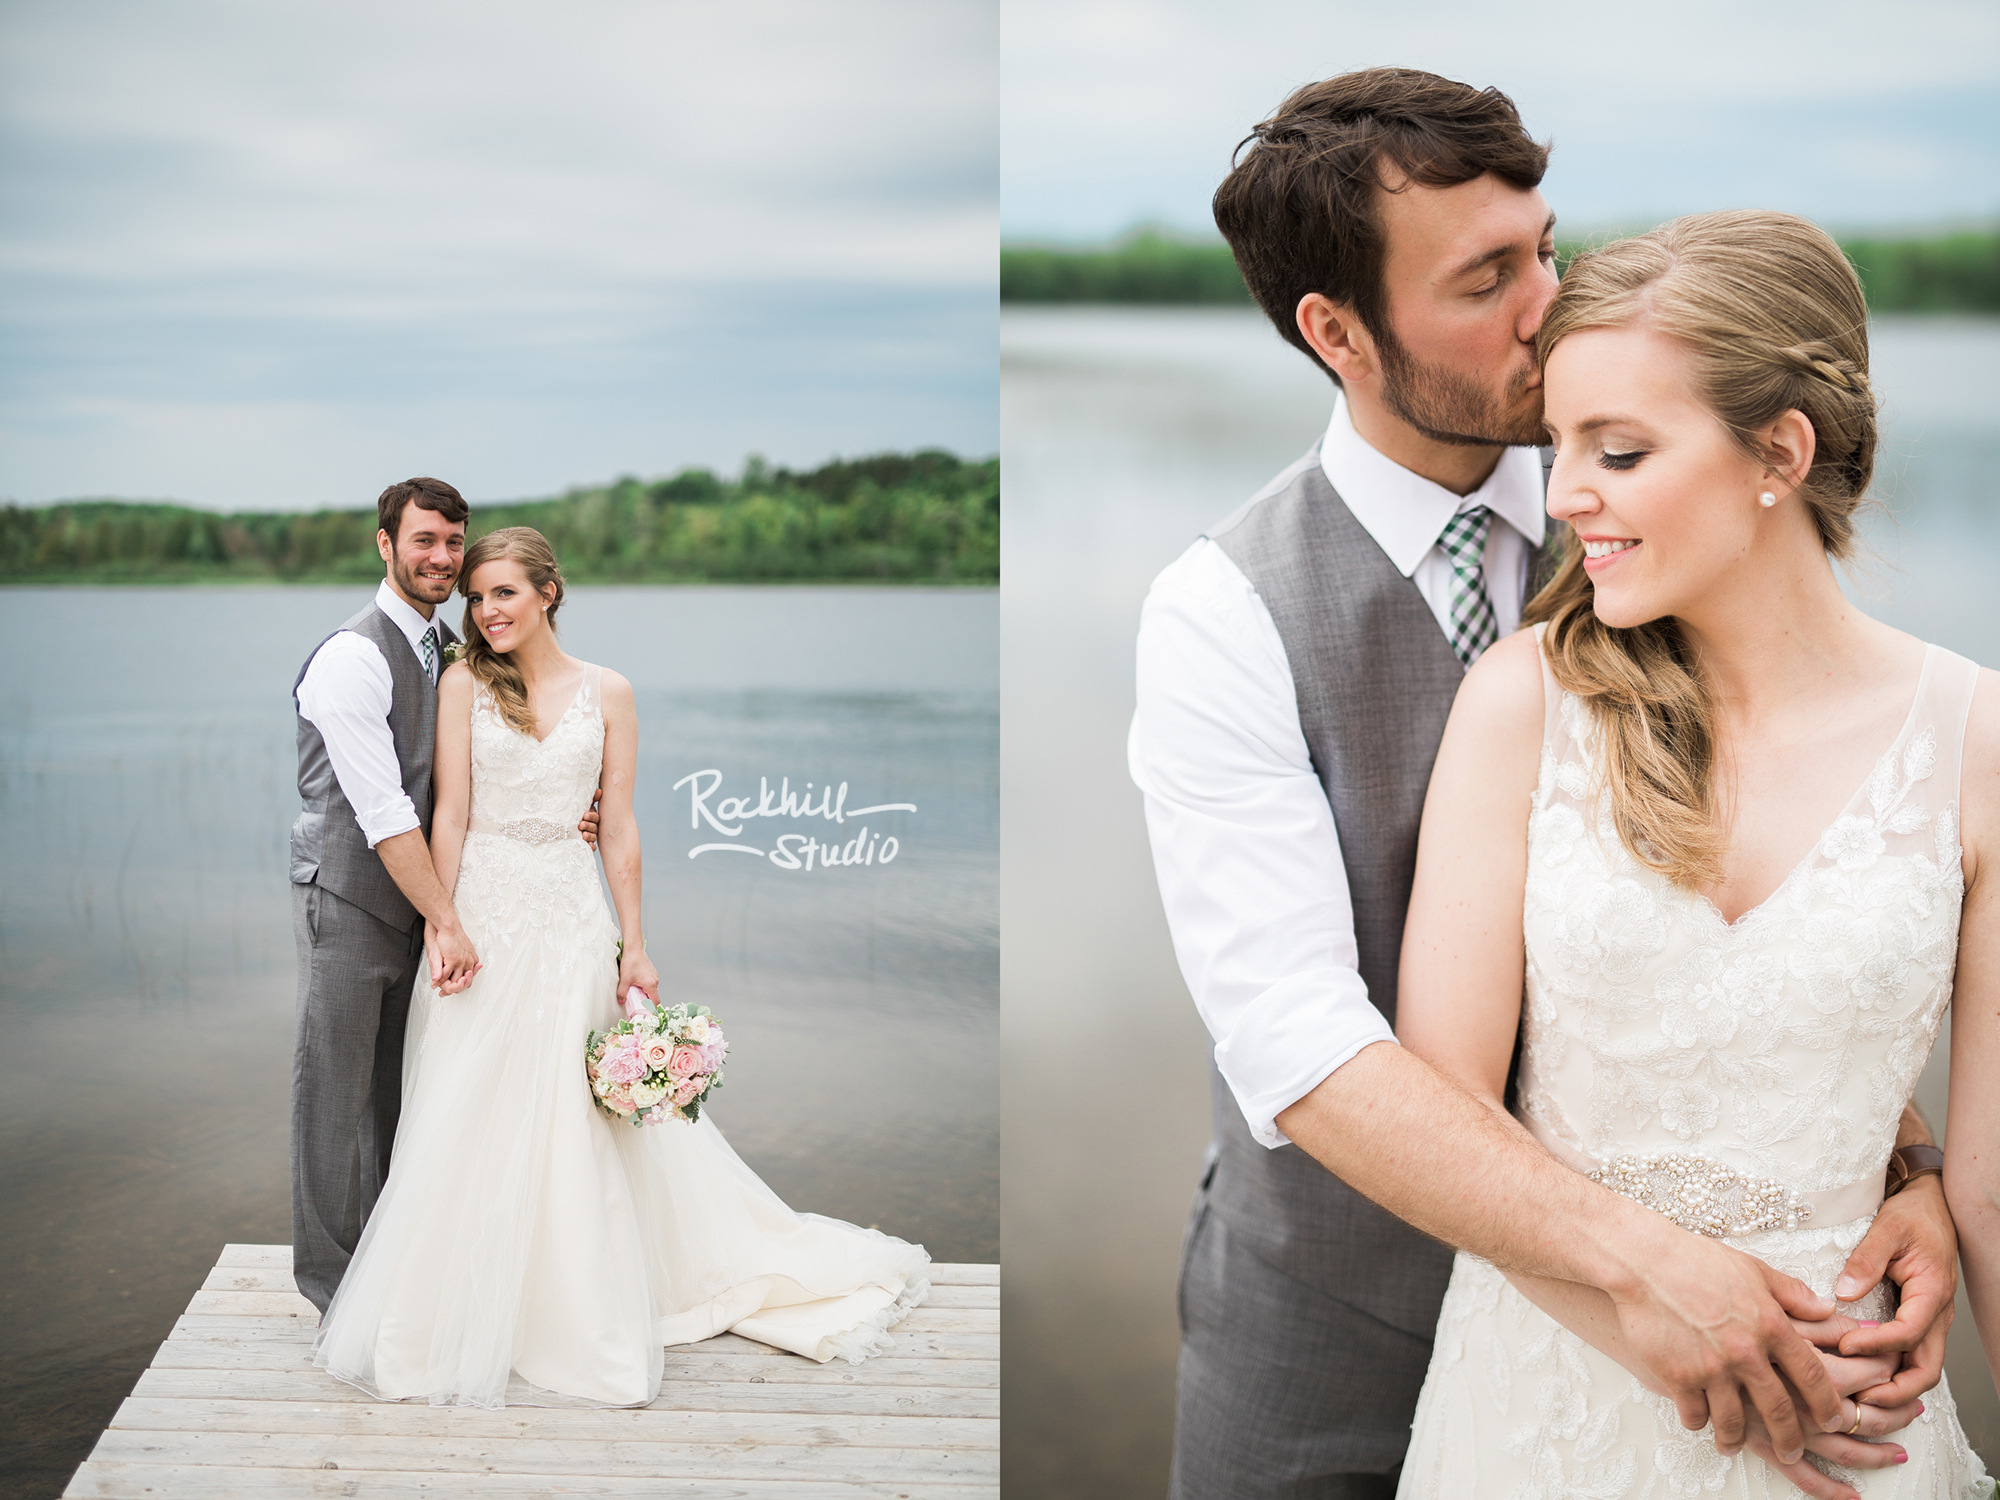 marquette-michigan-wedding-upper-peninsula-spring-photography-rockhill-ee-47.jpg